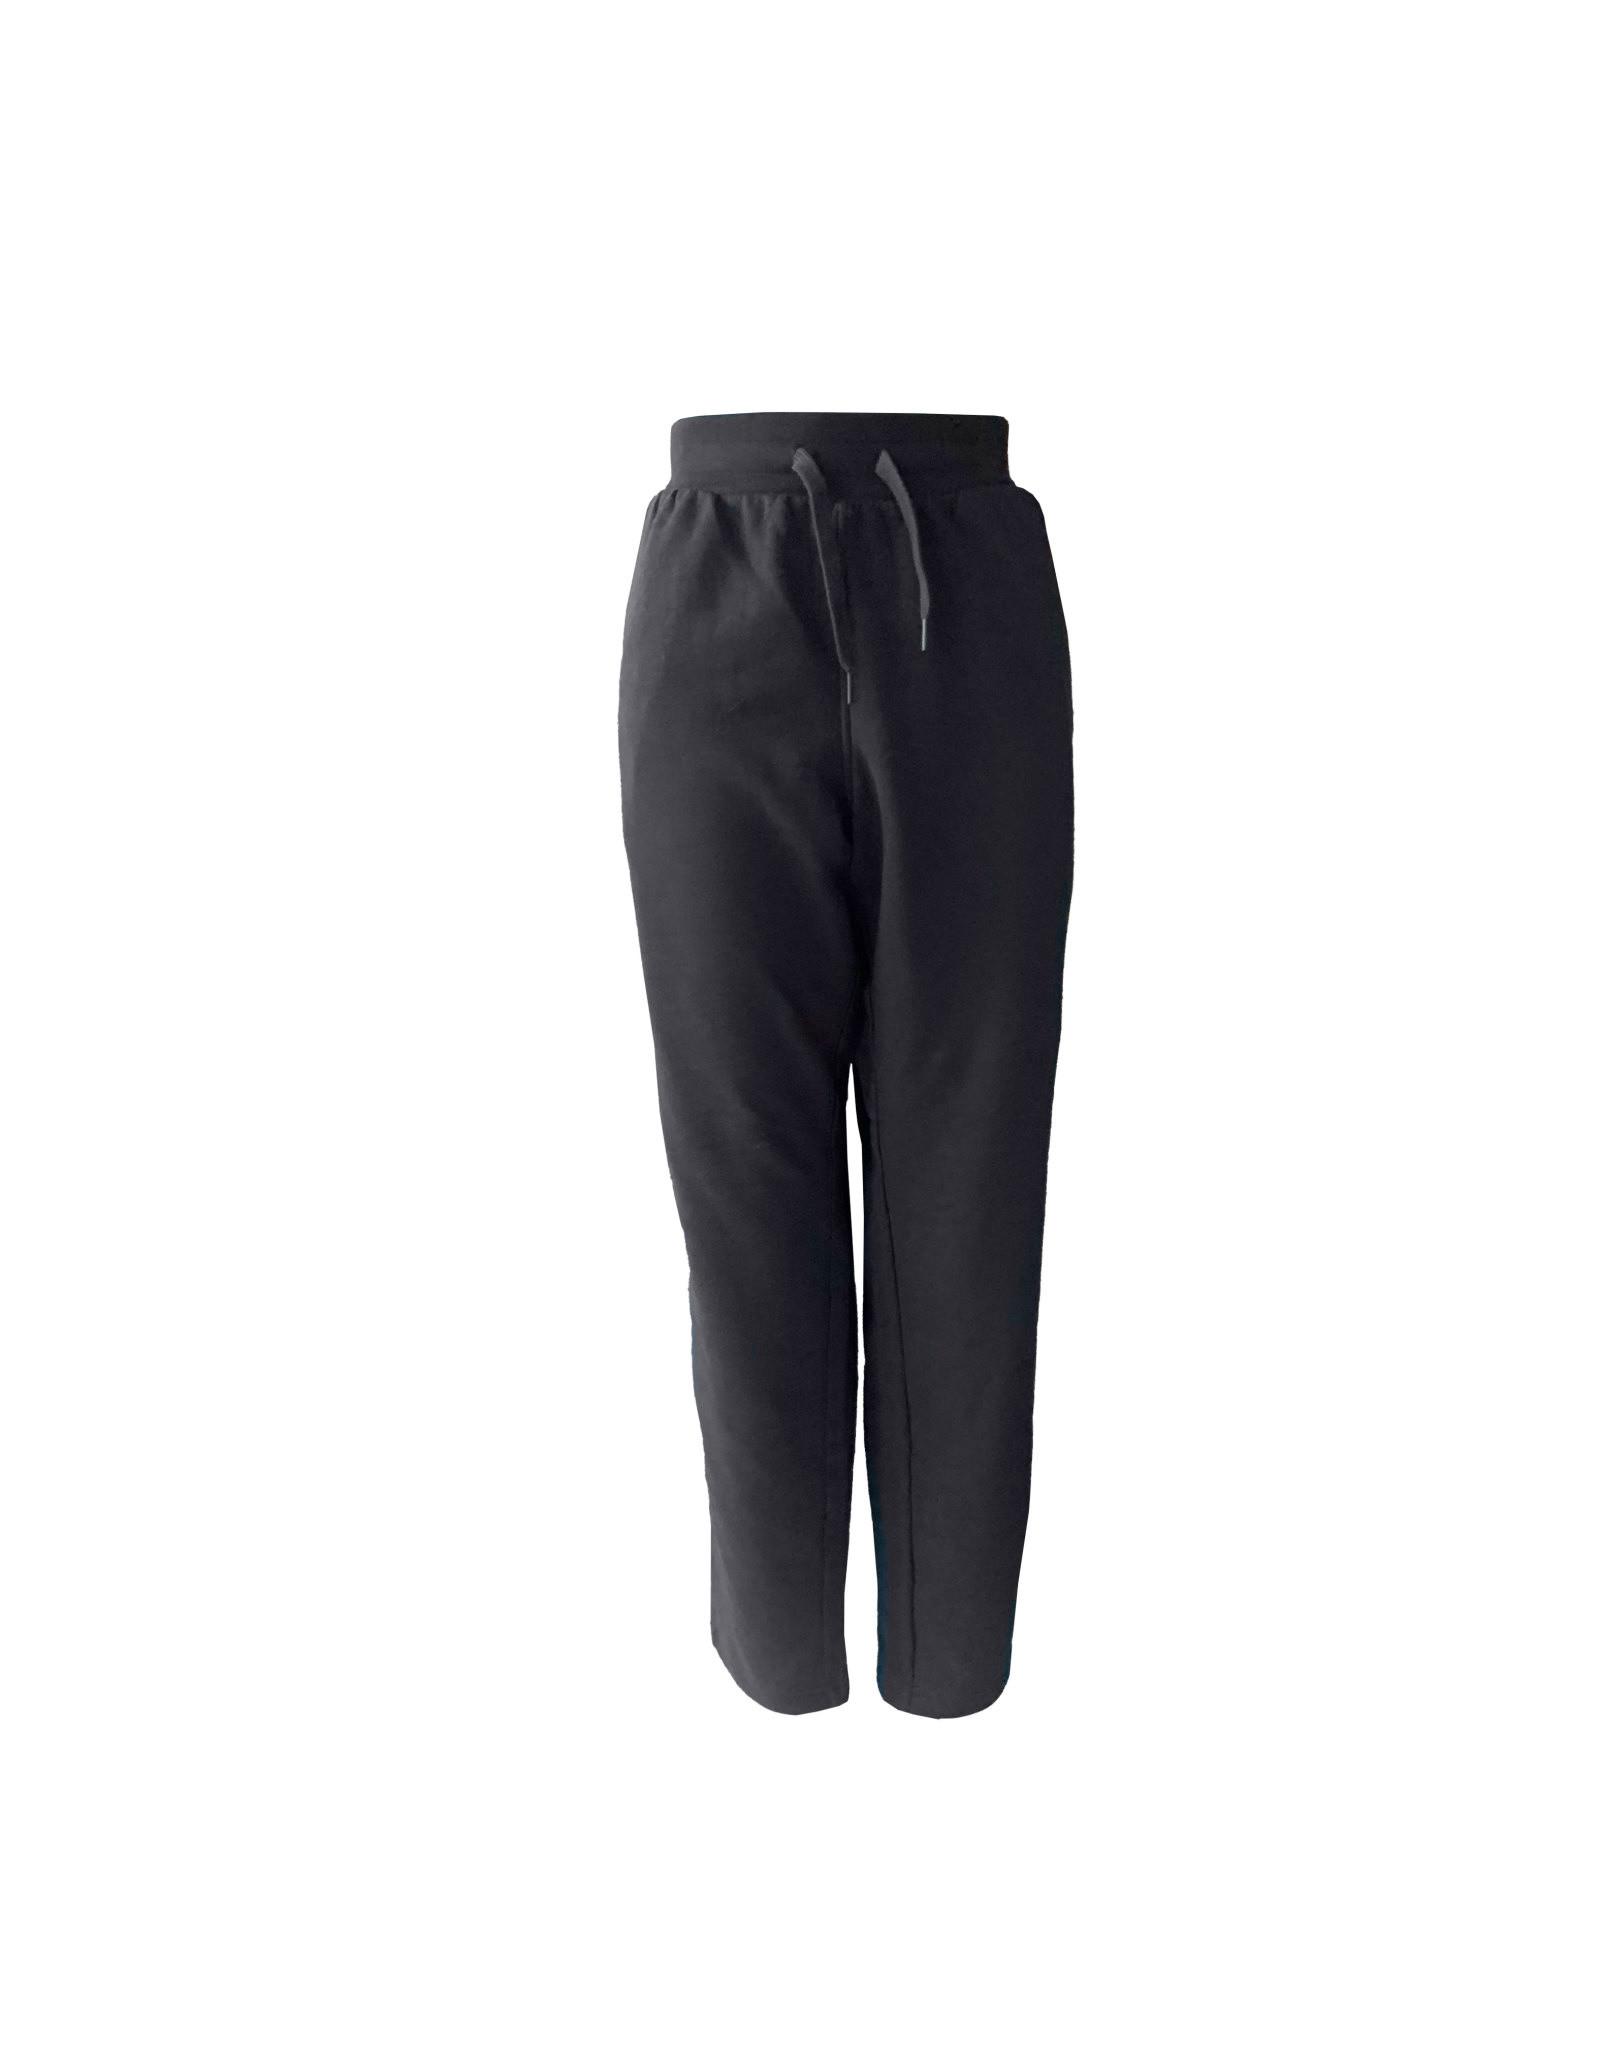 UNDER ARMOUR UNDER  ARMOUR  Women's Fleece Pants  SizeL